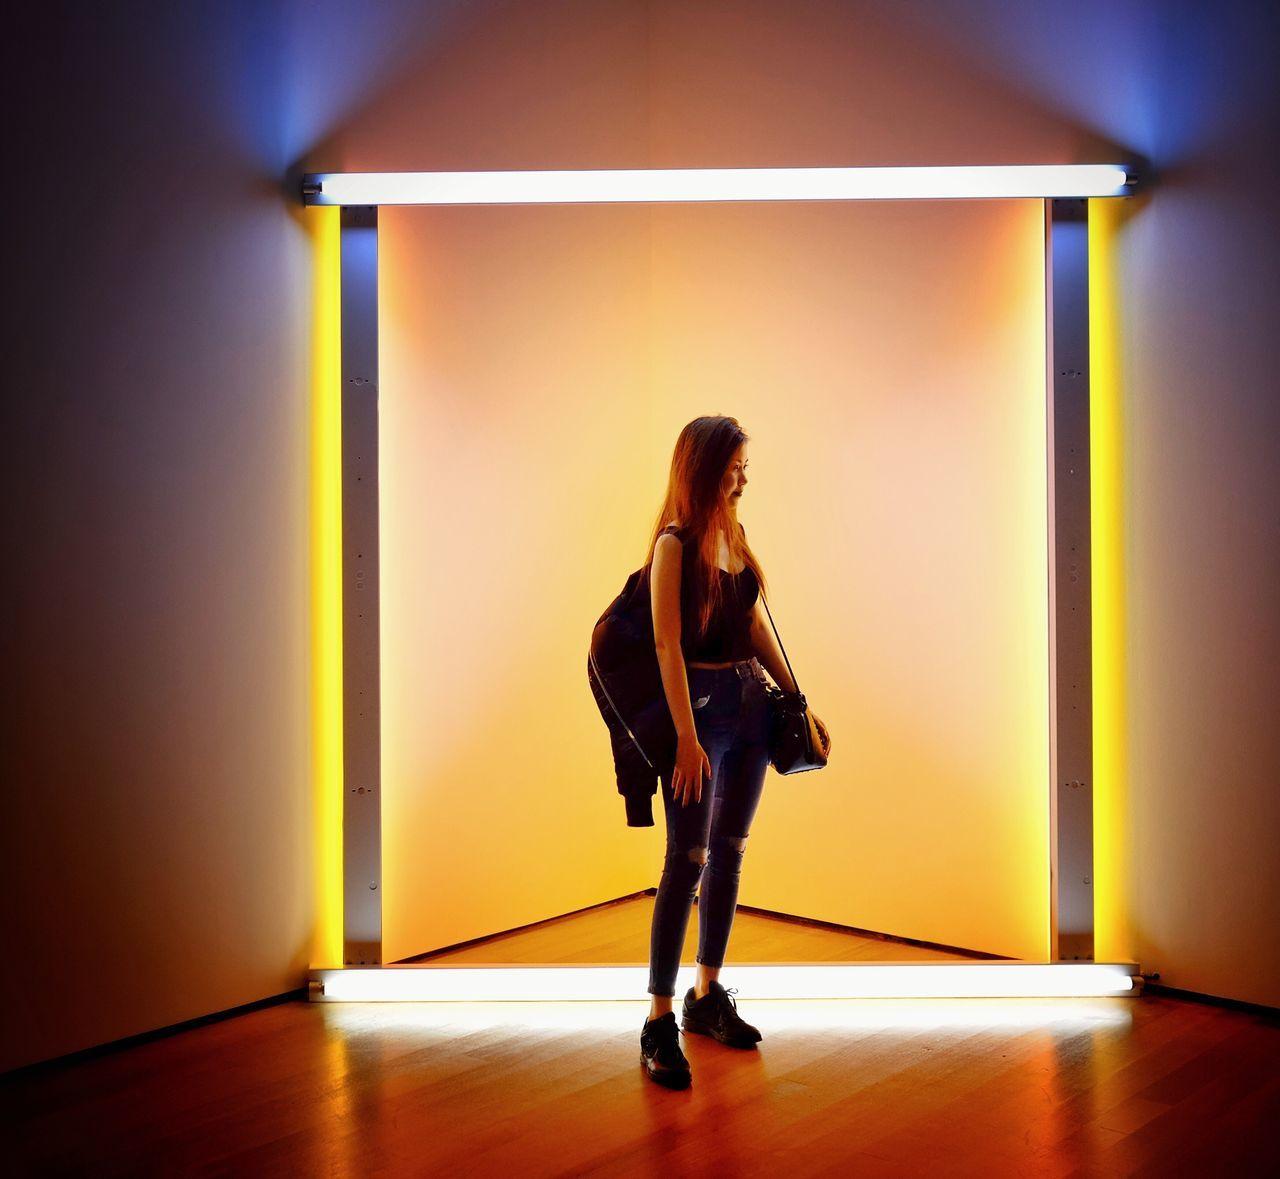 Fantastic Exhibition at Moma New York City Exploring Art People Of New York FUJIFILM X-T1